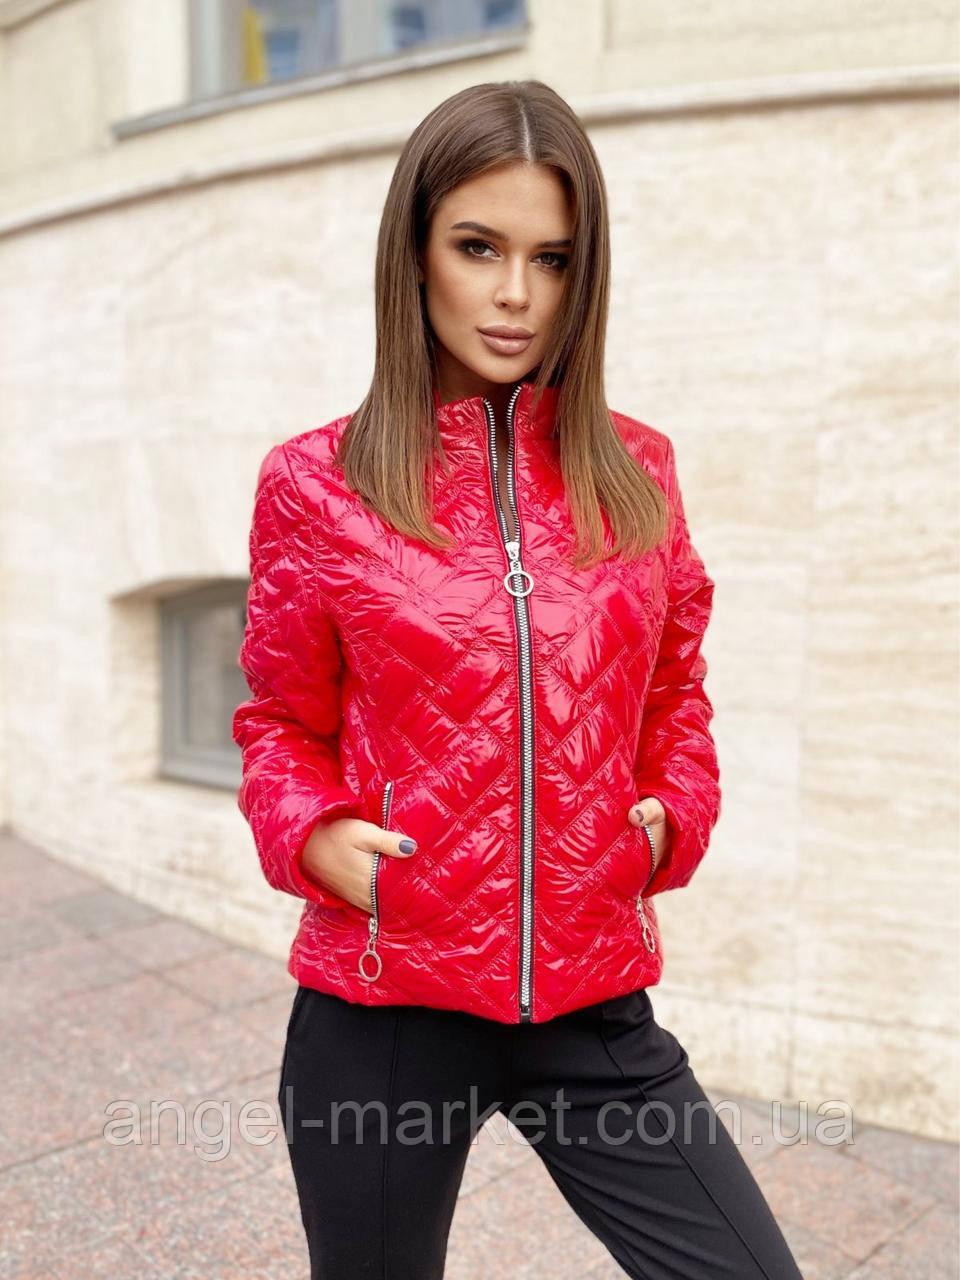 Осенняя  женская  куртка норма и батал Новинка 2020